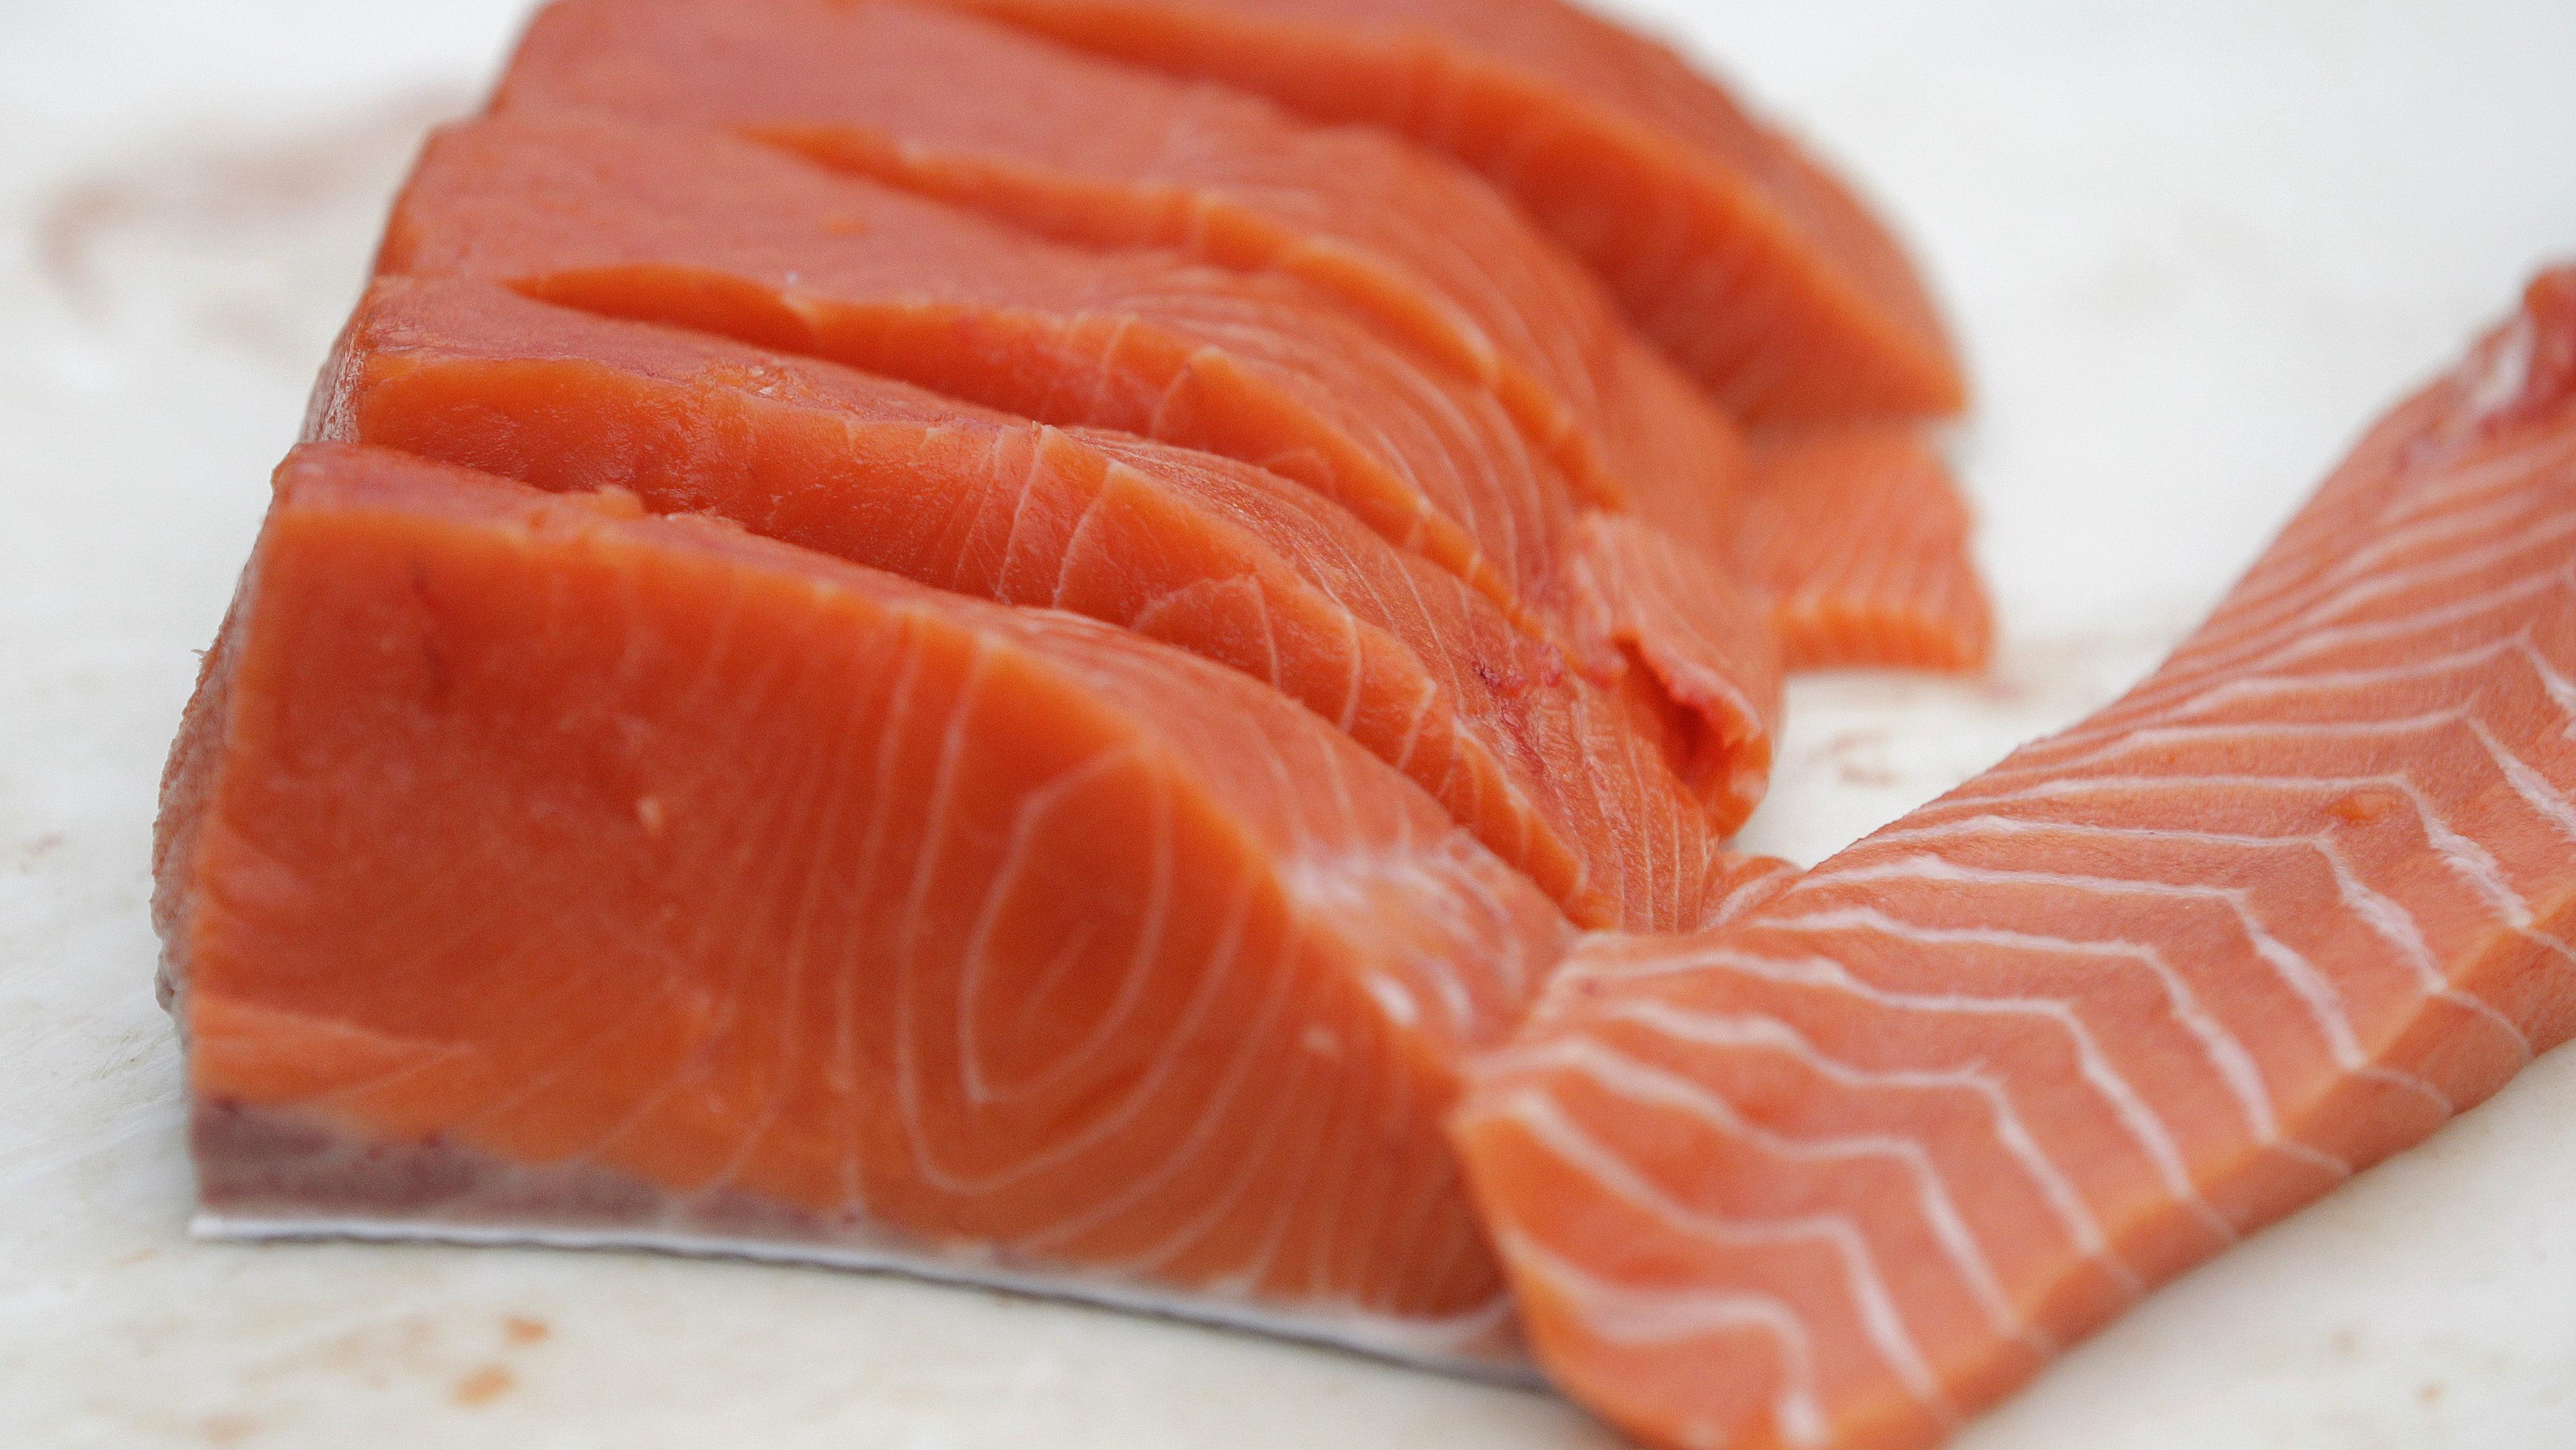 salmon-genetically-modified-gmo 2